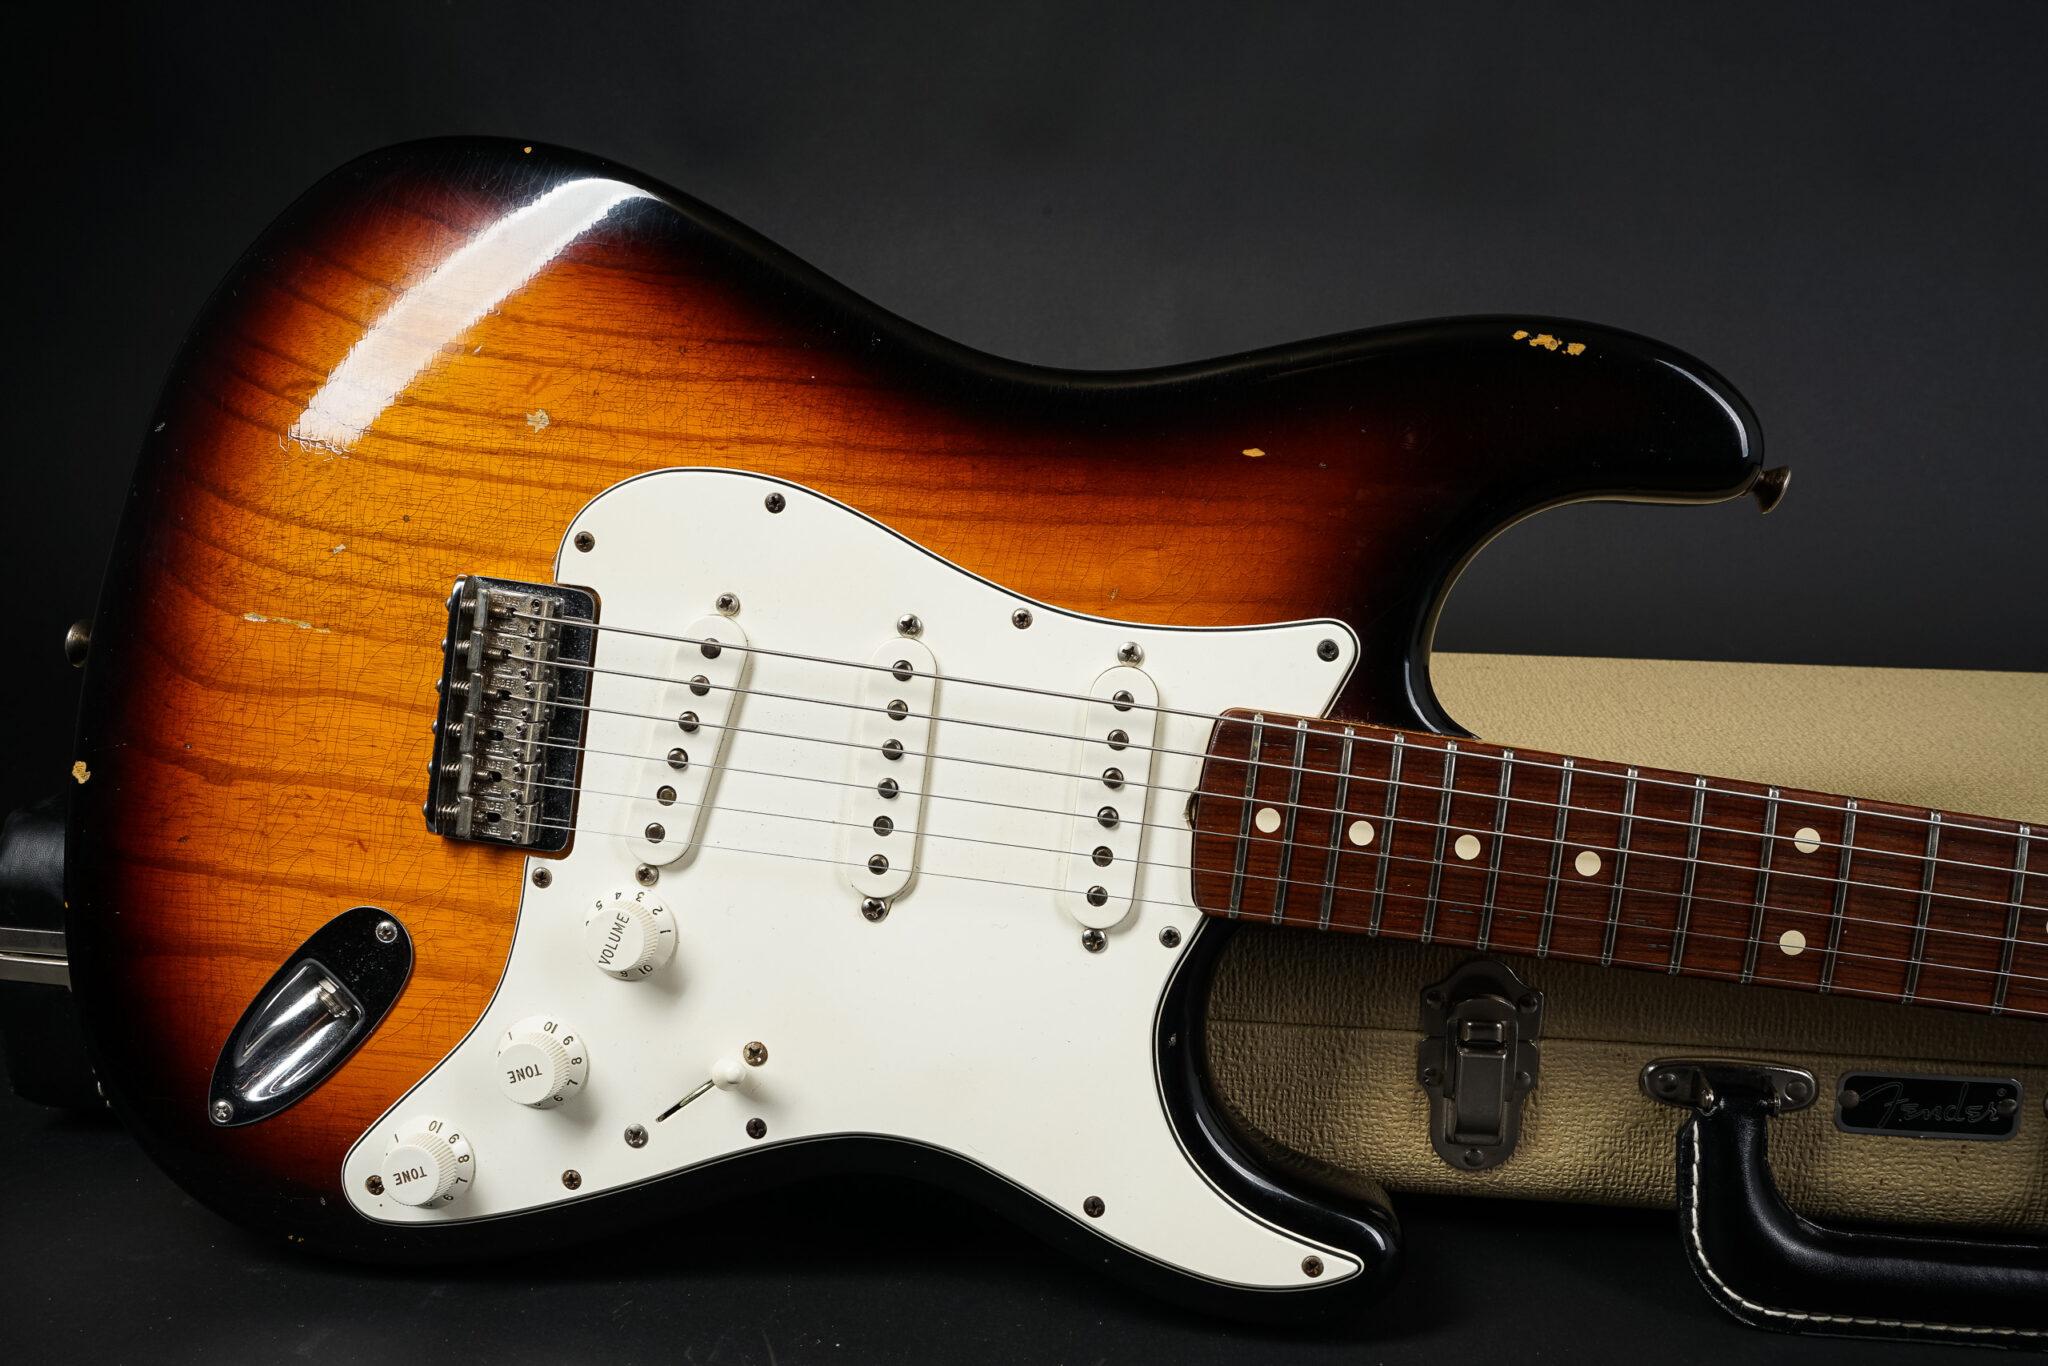 https://guitarpoint.de/app/uploads/products/2010-fender-dennis-galuszka-masterbuilt-1960-hardtail-stratocaster-relic/2010-Fender-MBDG-1960-Hardtail-Strat-R48426-9-2048x1366.jpg